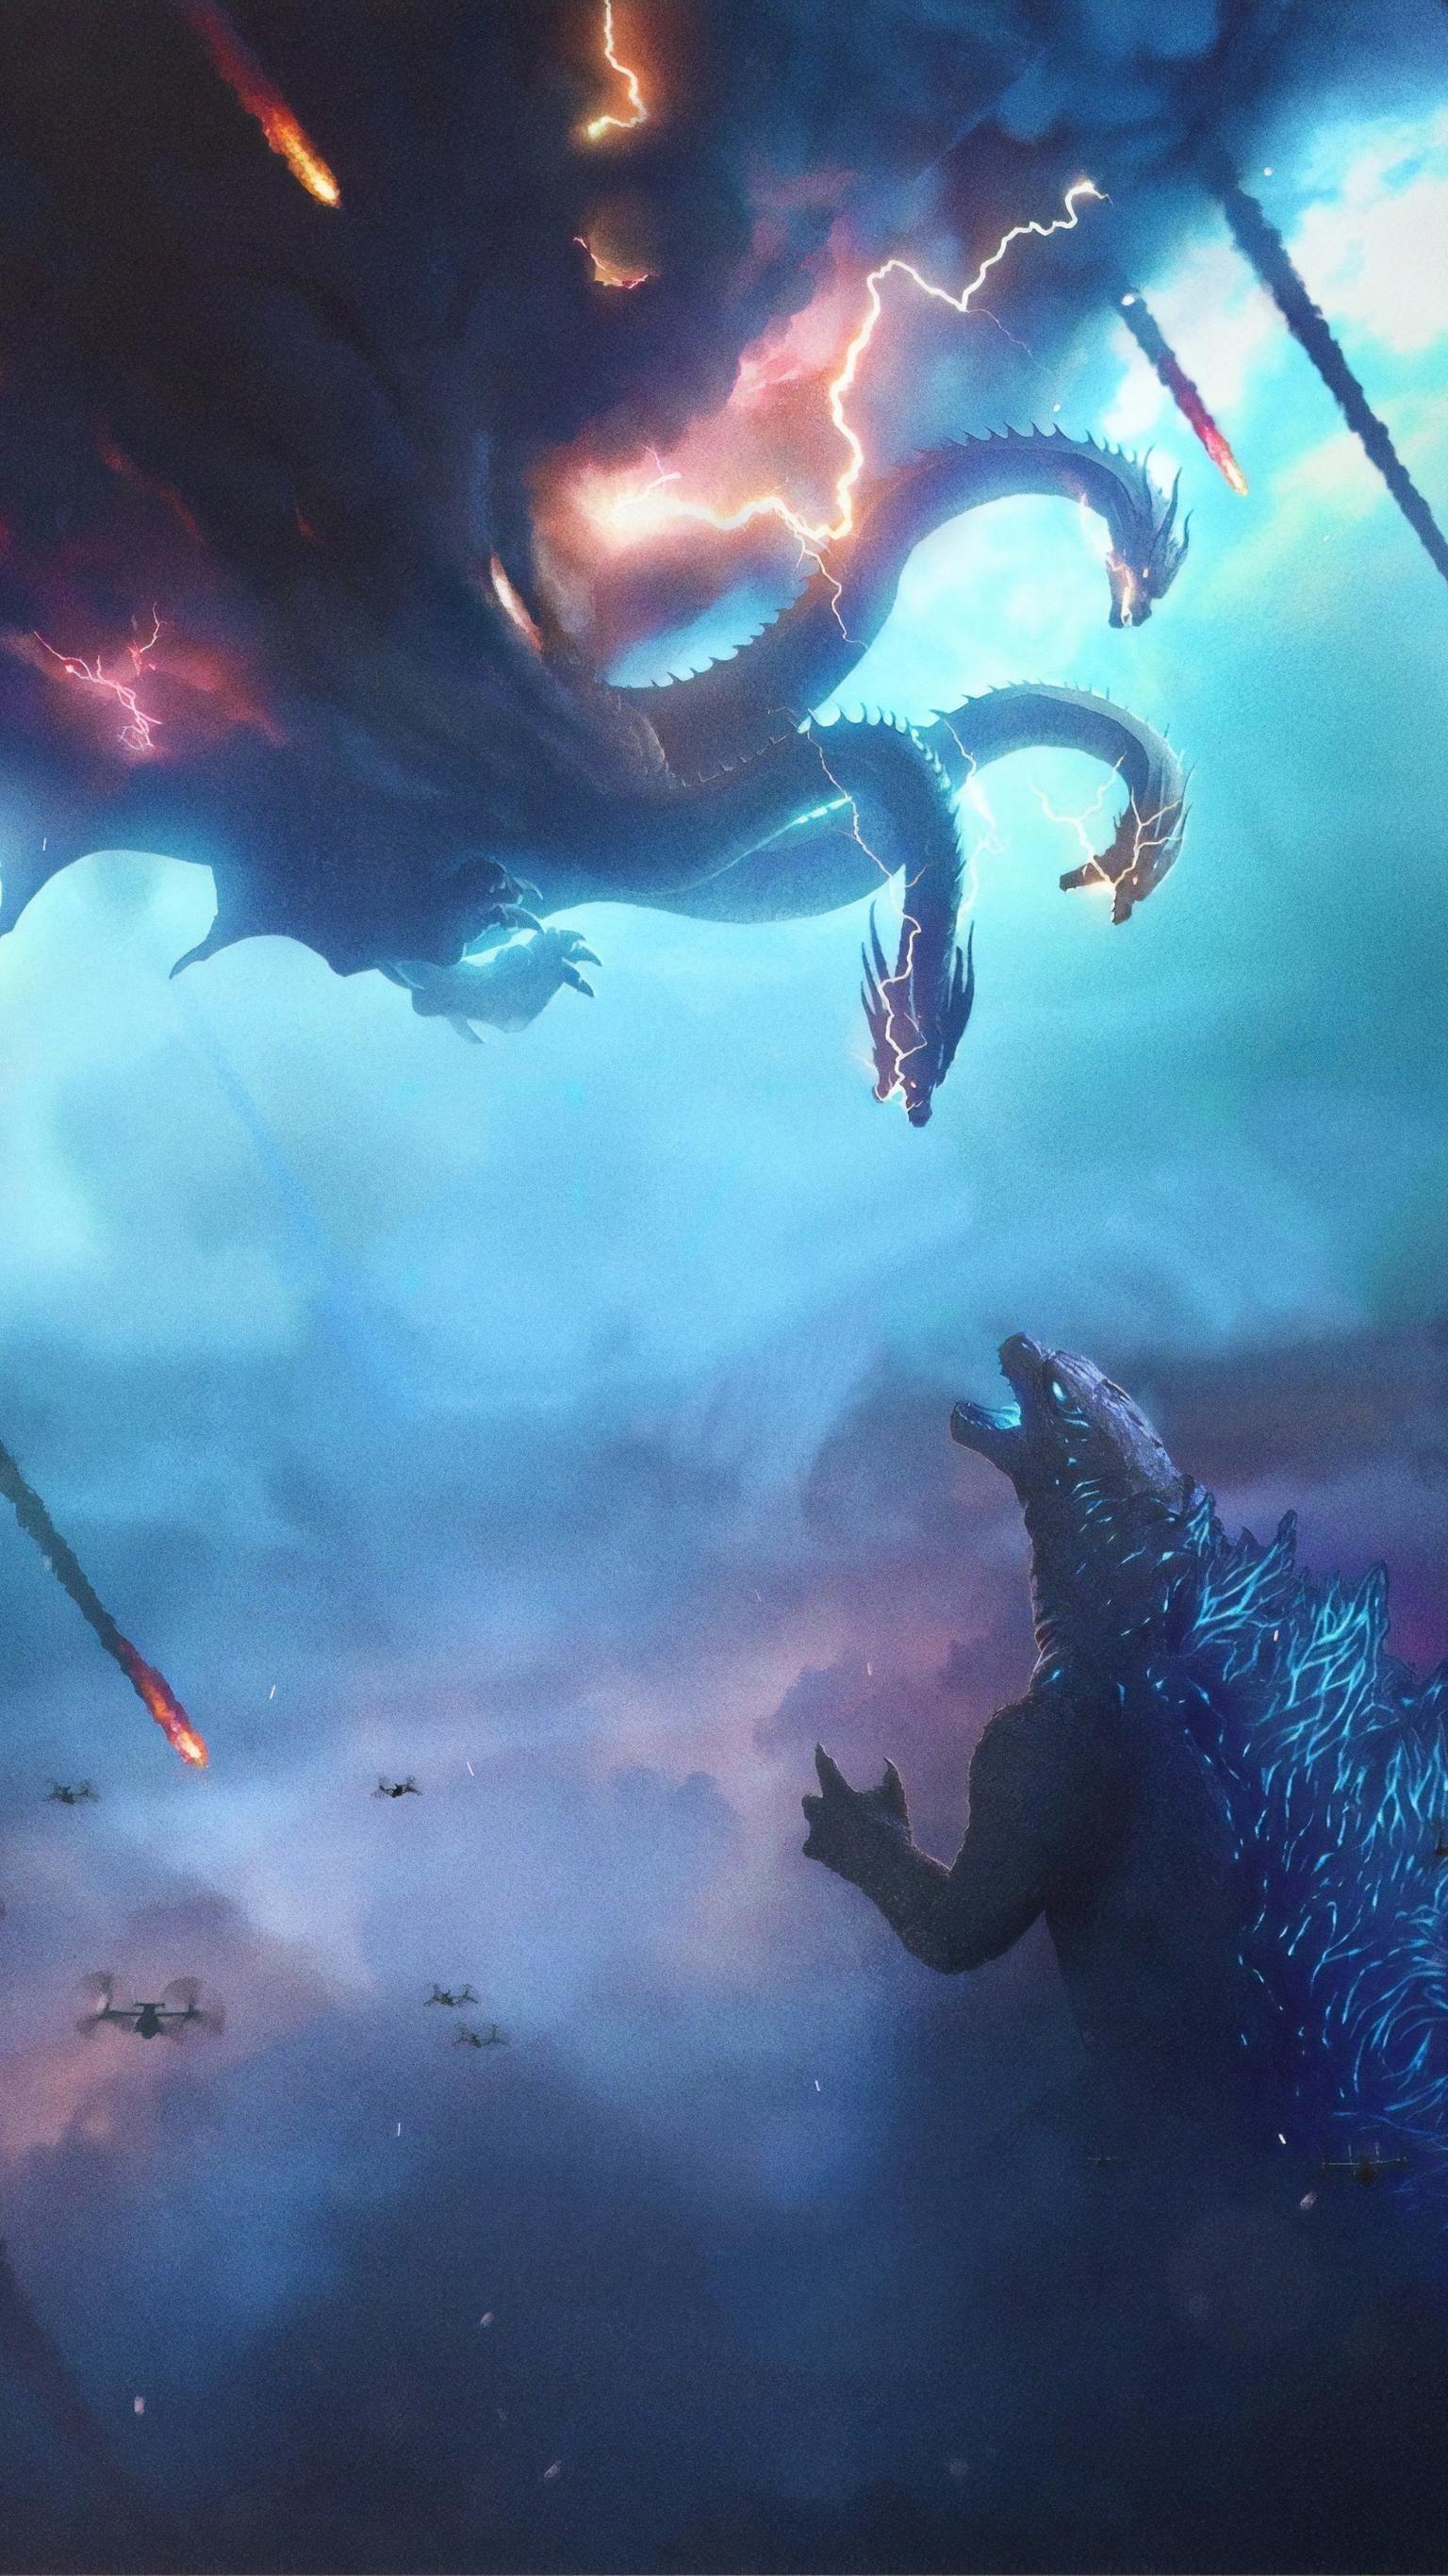 Moviemania Textless High Resolution Movie Wallpapers Godzilla Wallpaper Godzilla Vs King Ghidorah Godzilla Tattoo